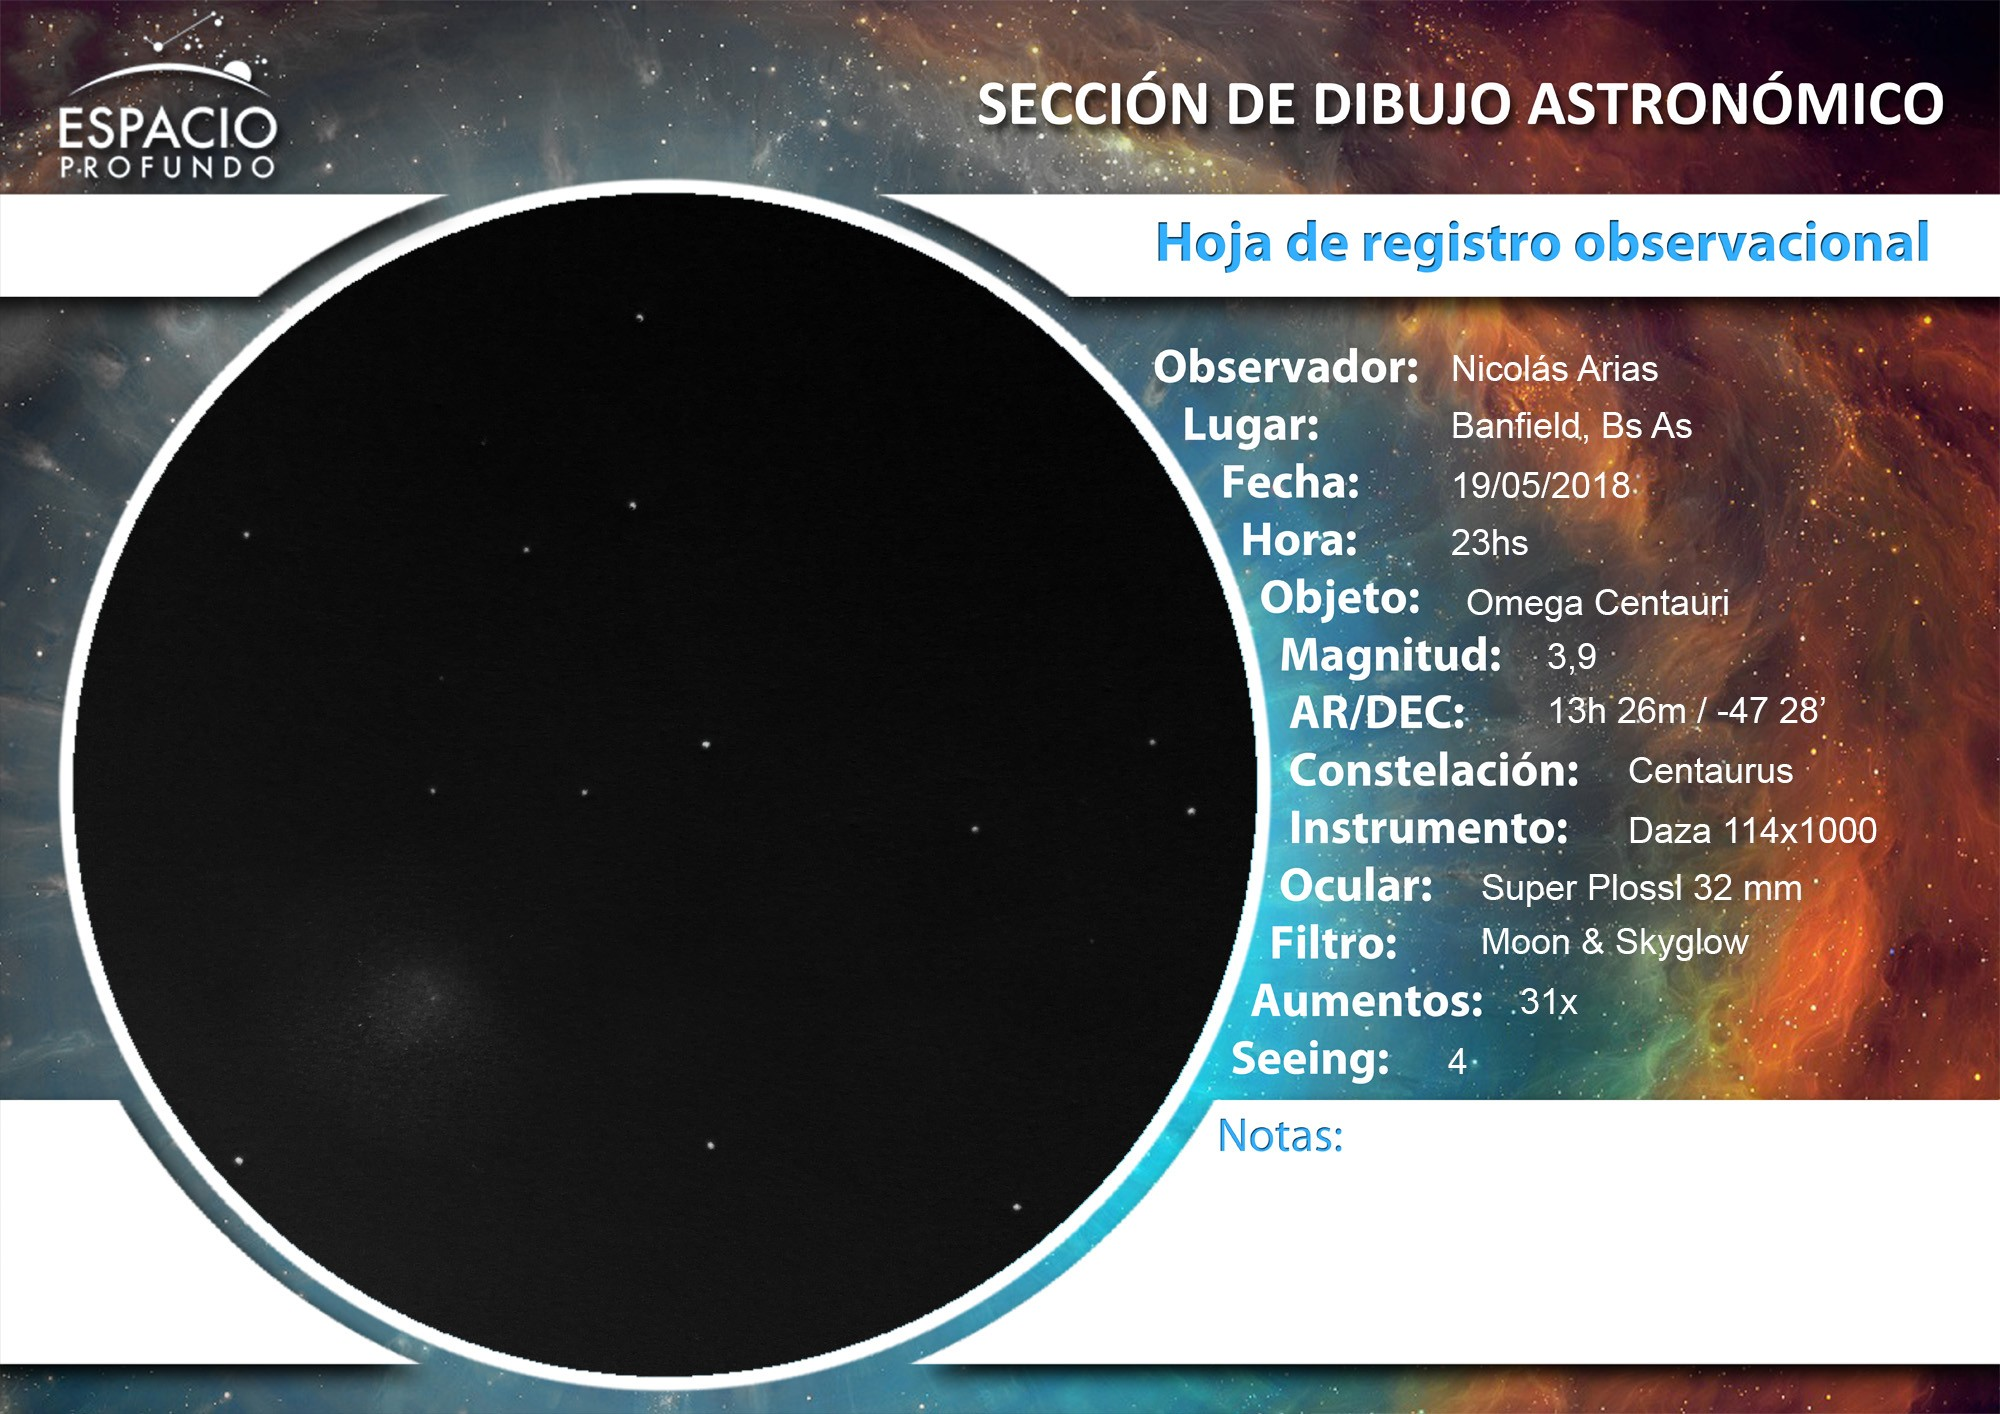 Registro_Observacional 19-5 Omega Centauri